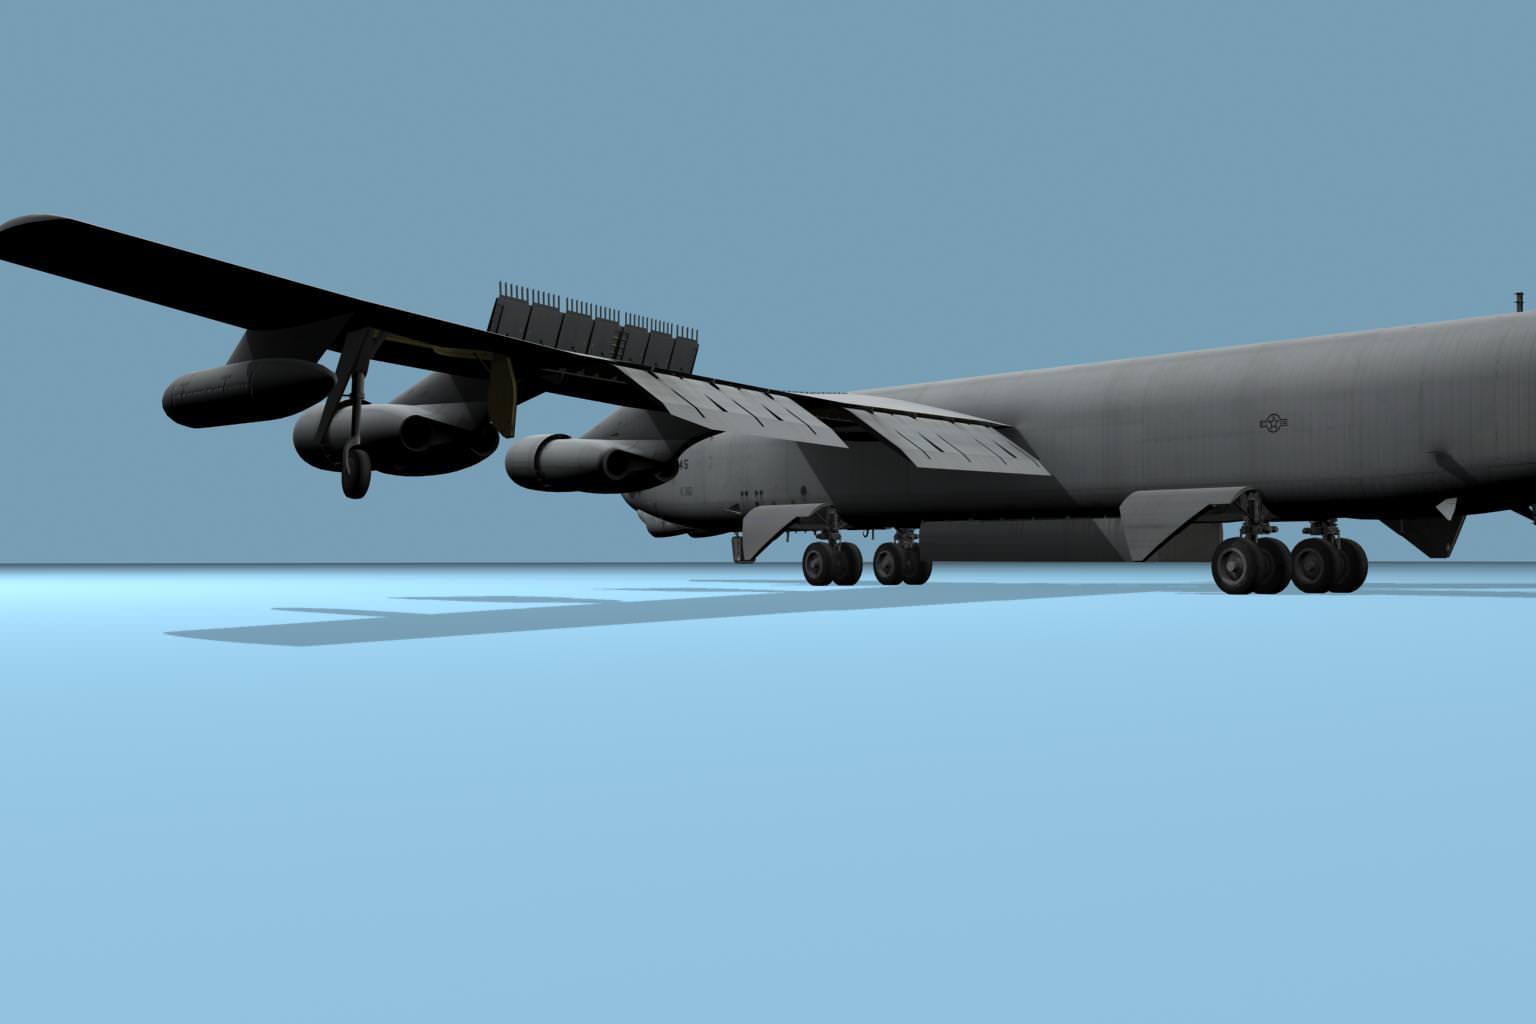 Boeing B52 Stratofortress 3D Model MAX FBX C4D - CGTrader.com